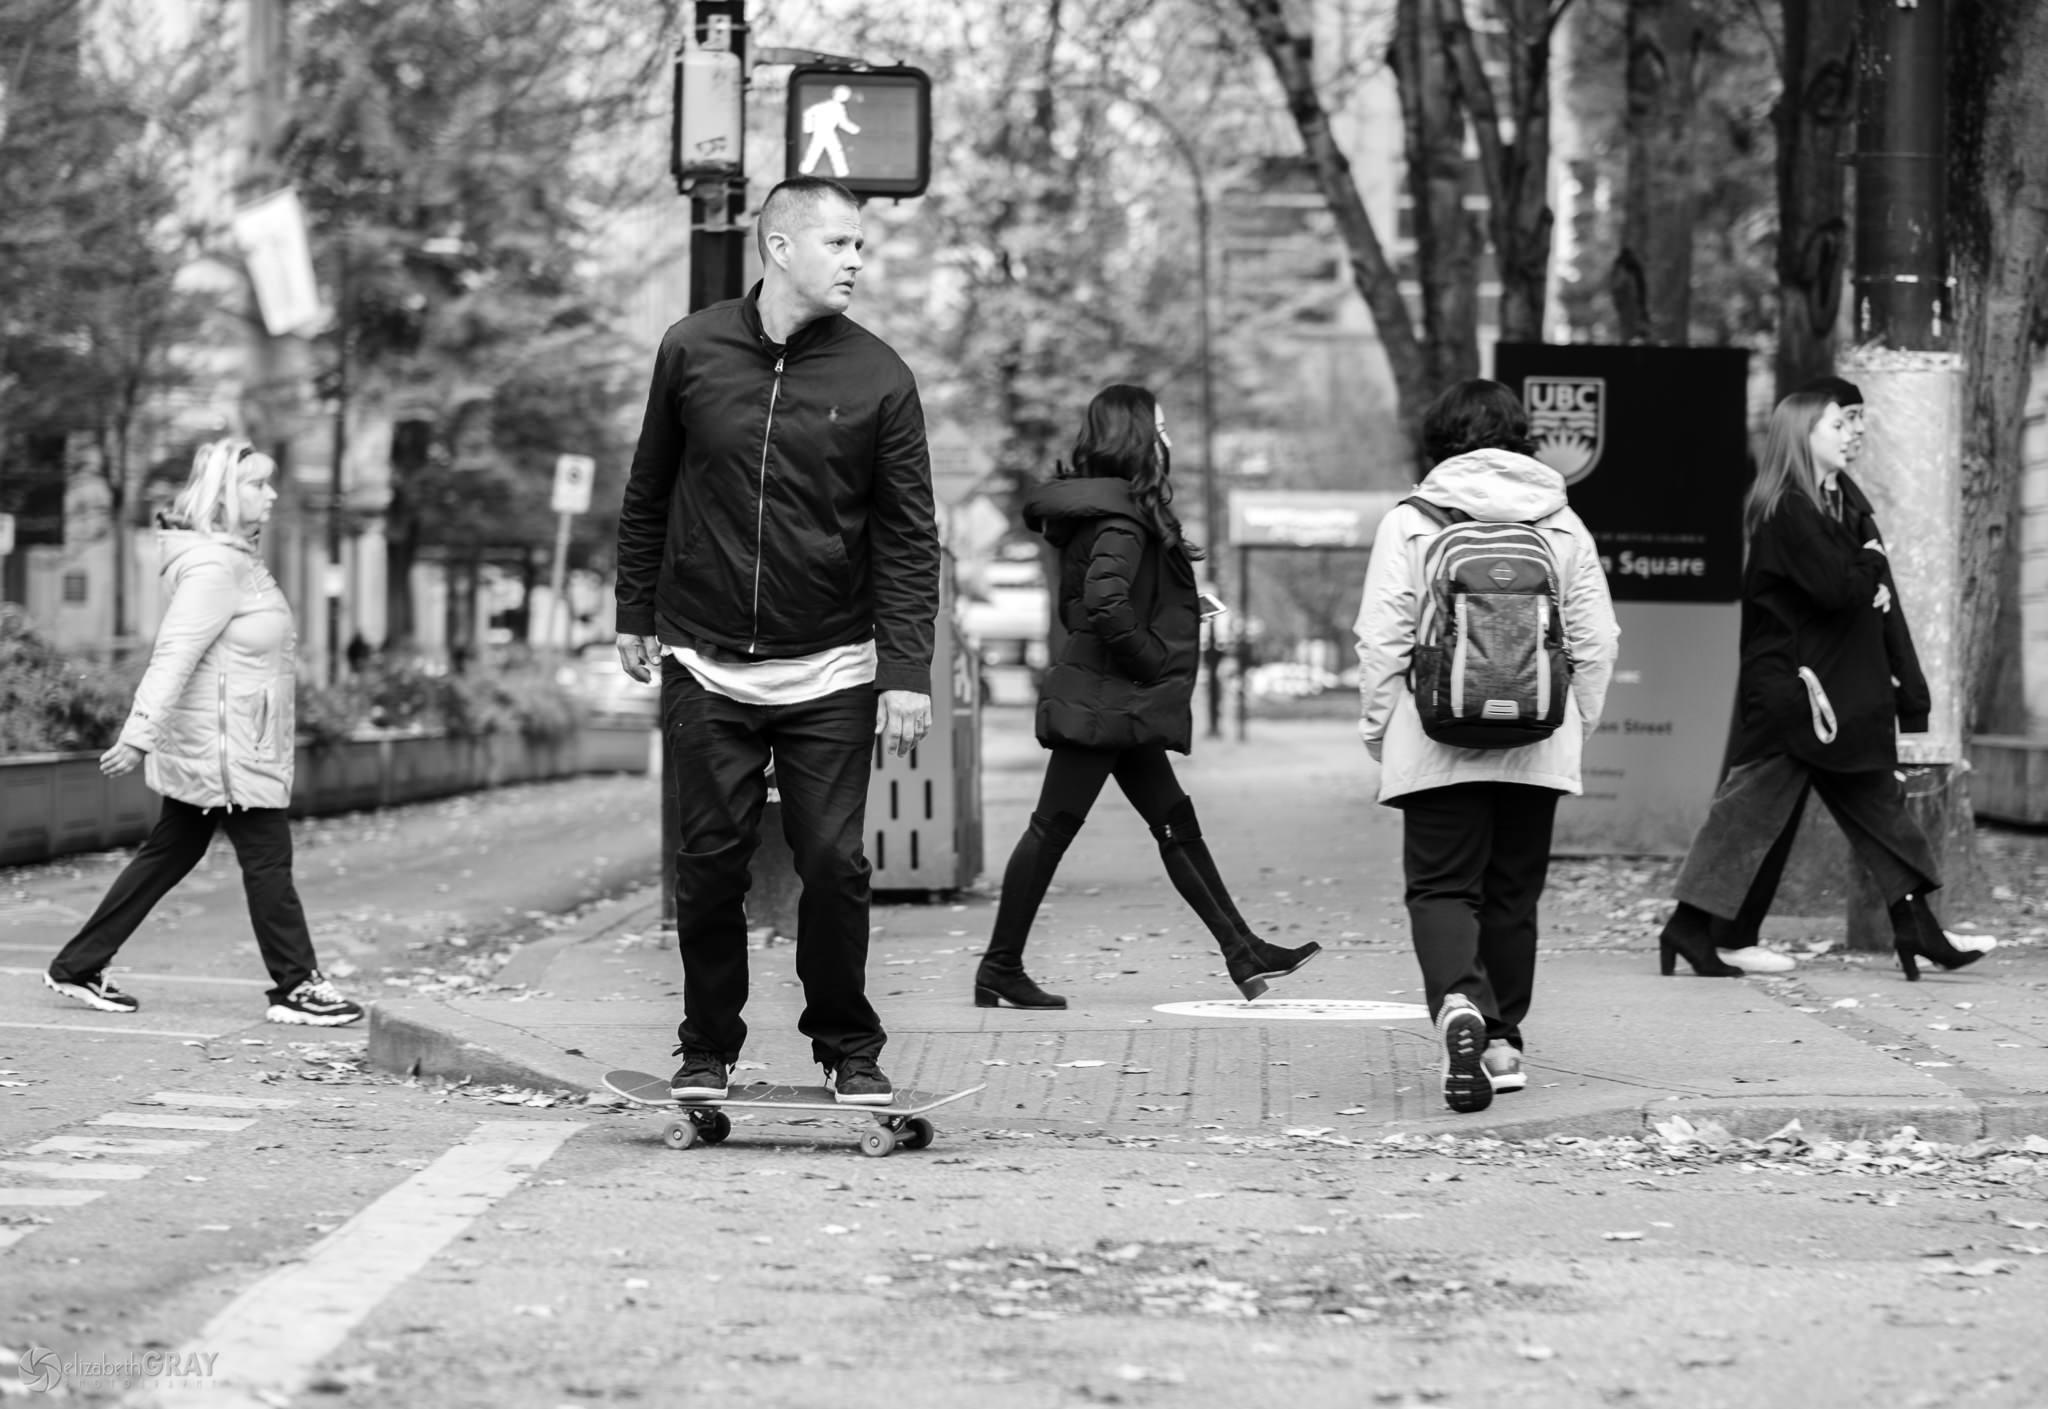 Walk ... or Skate!